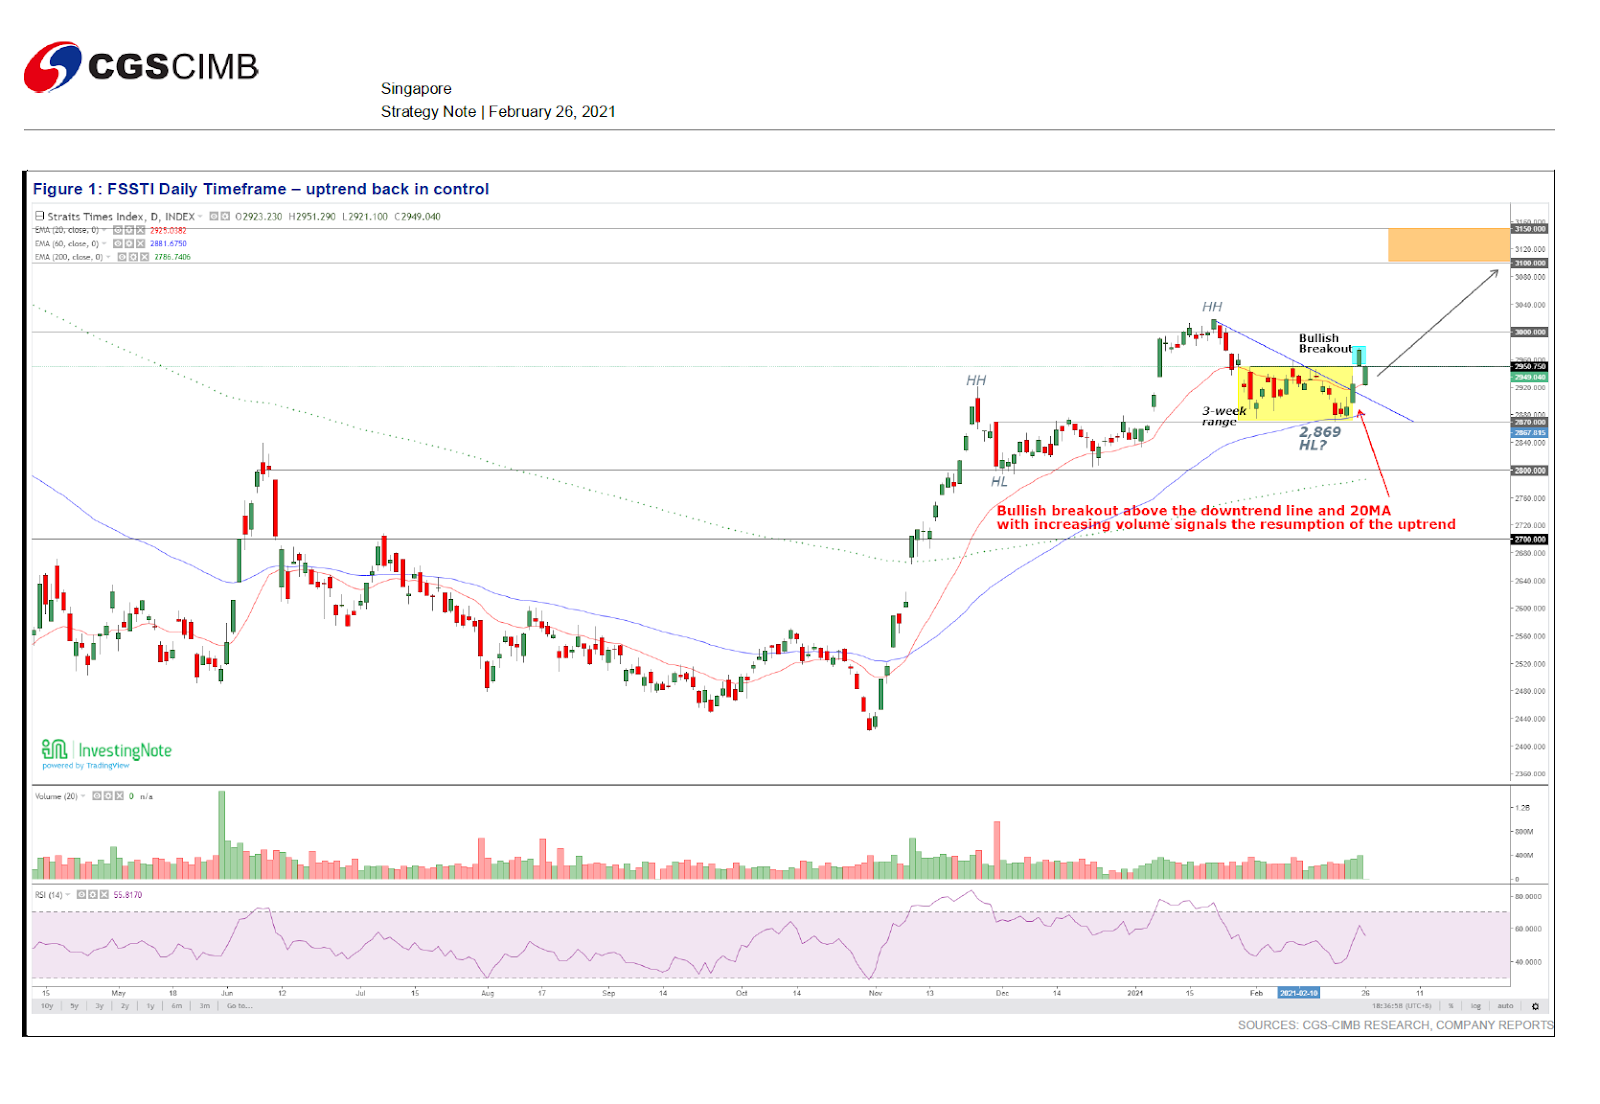 Singapore Market The Straits Times Index - CGS-CIMB Research   SGinvestors.io